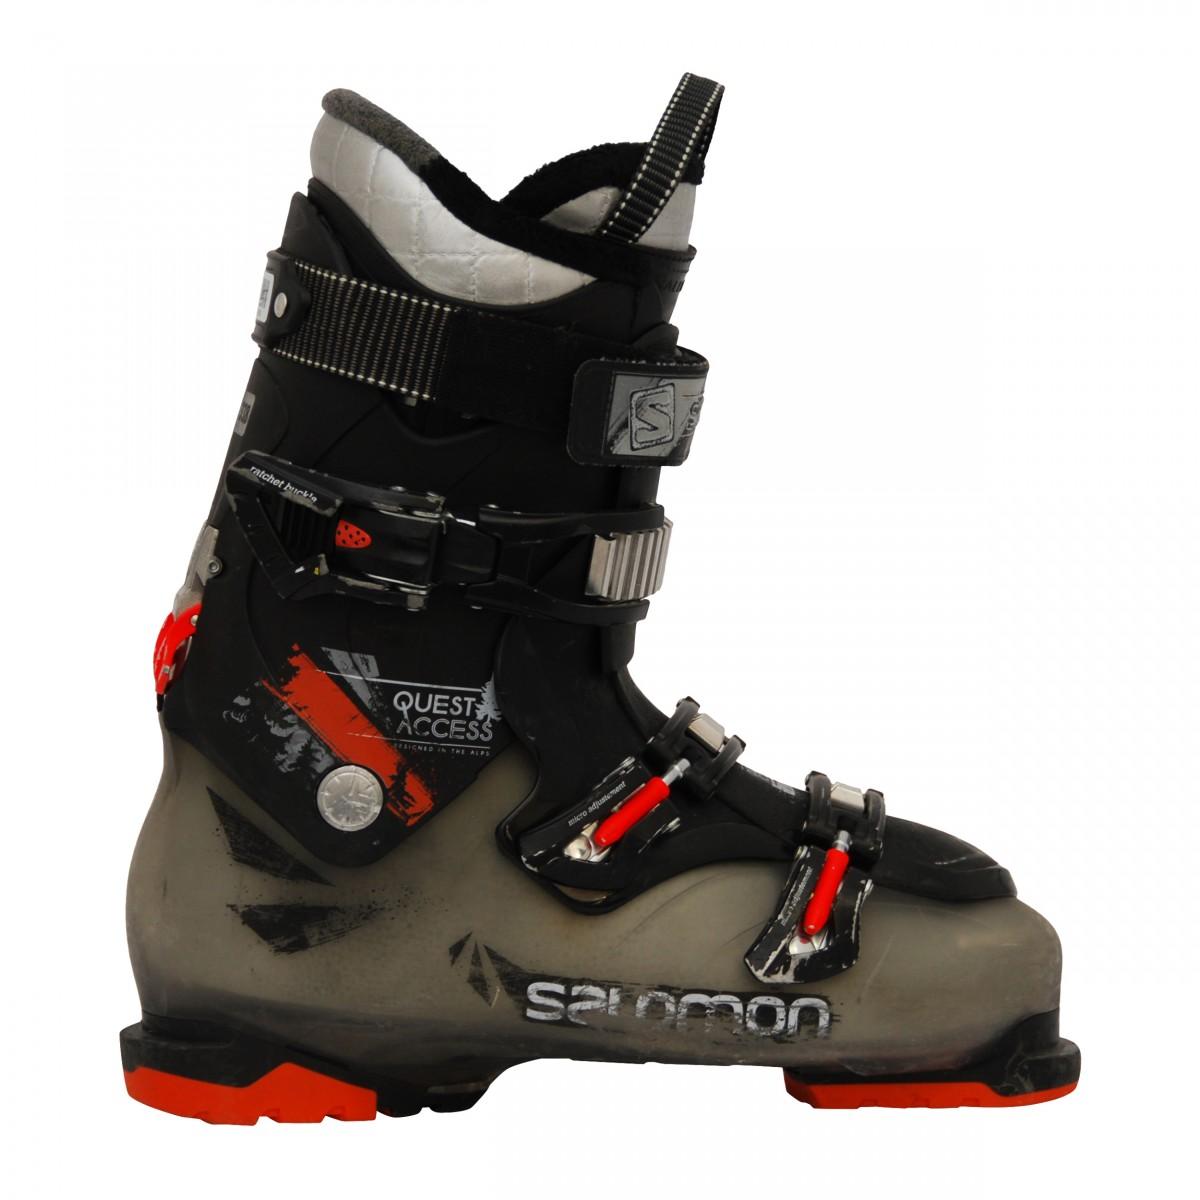 Chaussures de ski occasion Salomon idol 880 blanc marron